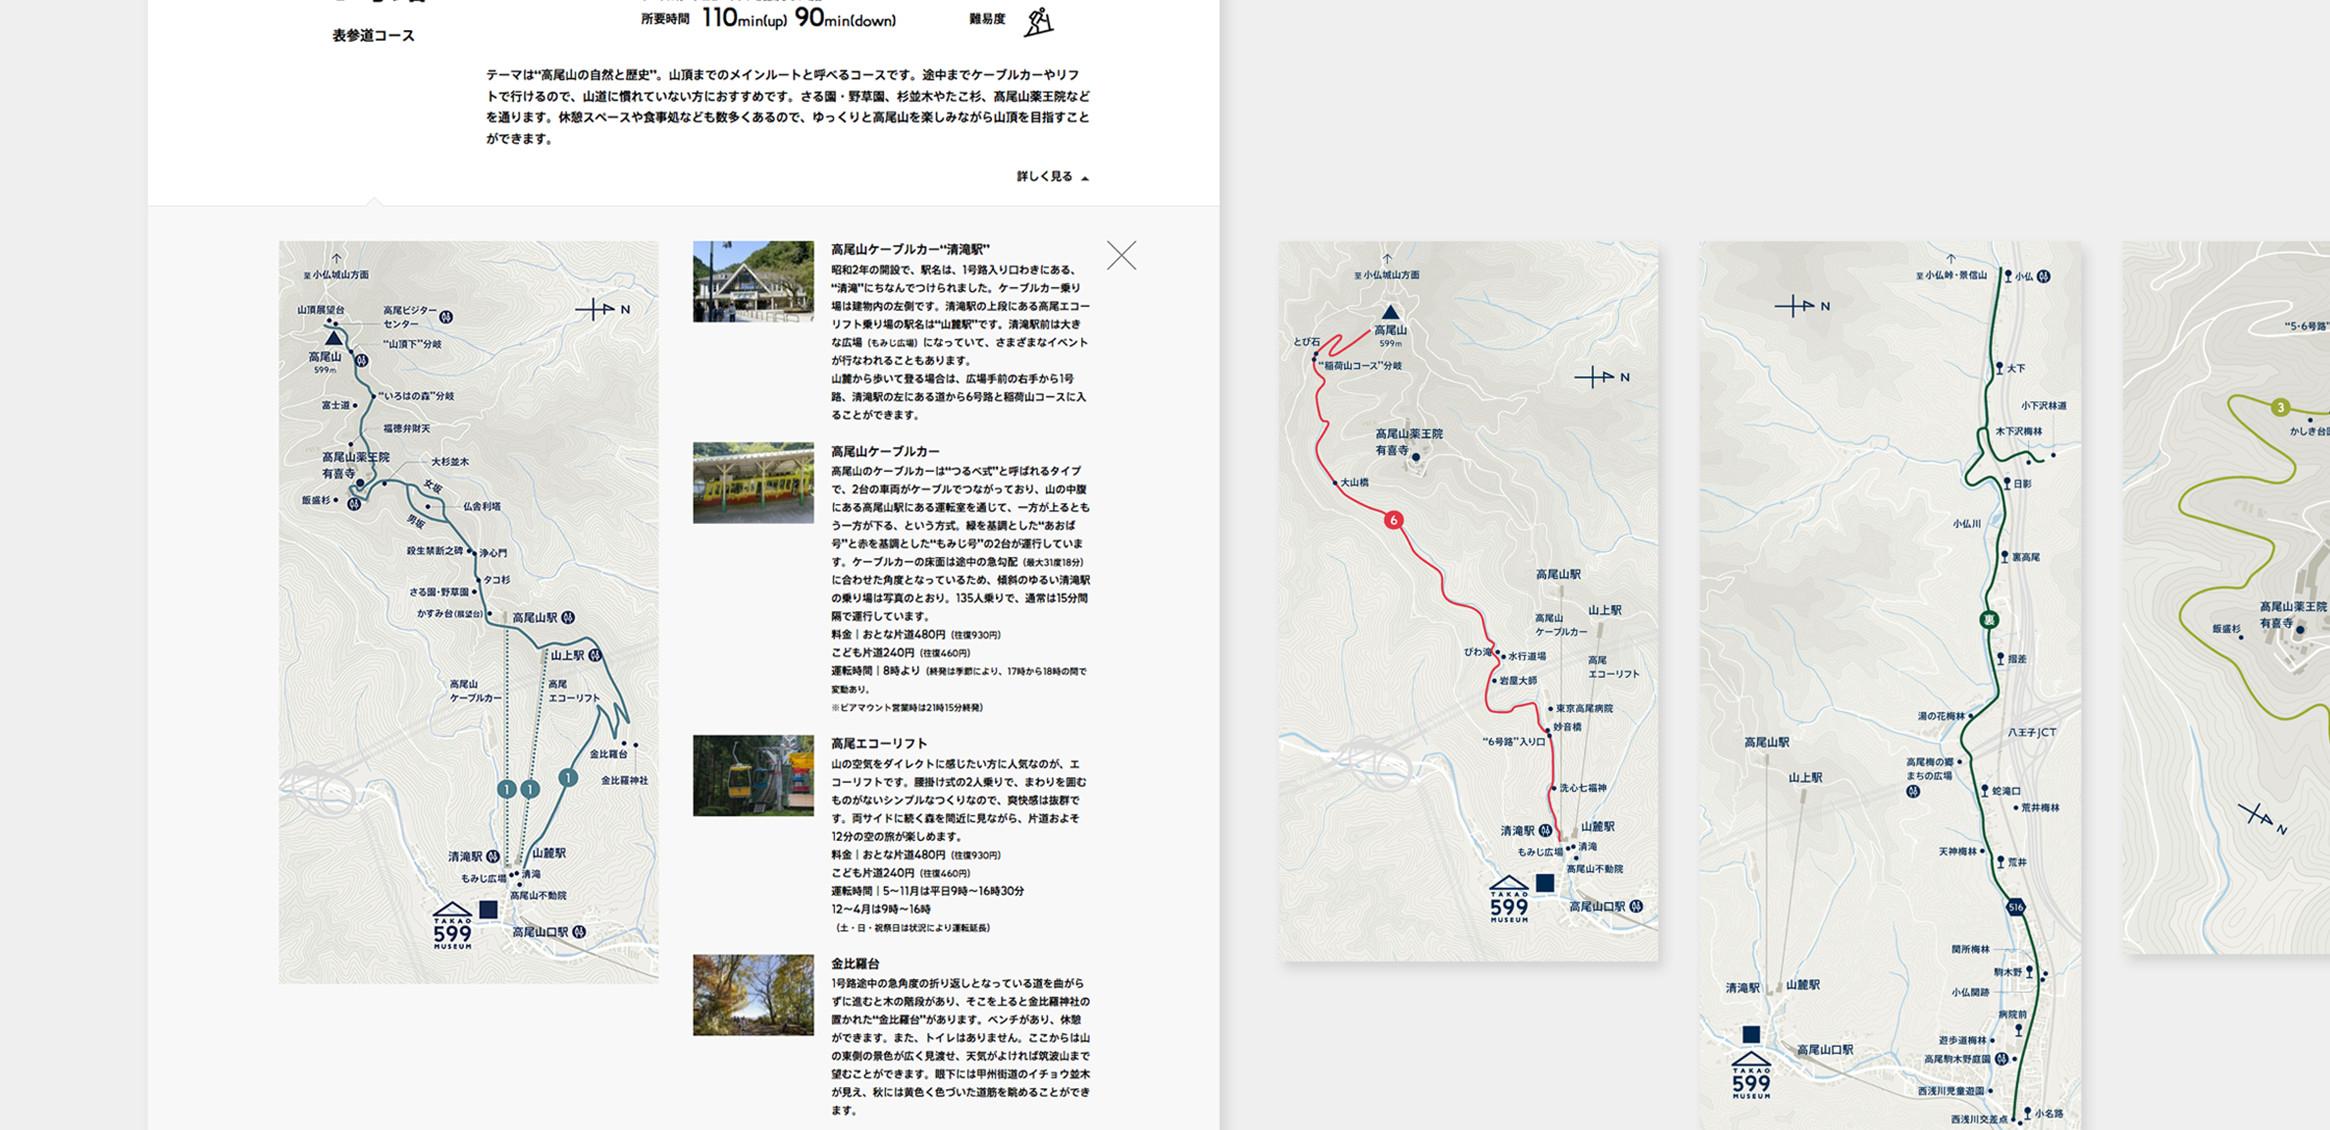 TAKAO 599 MUSEUM Web4枚目